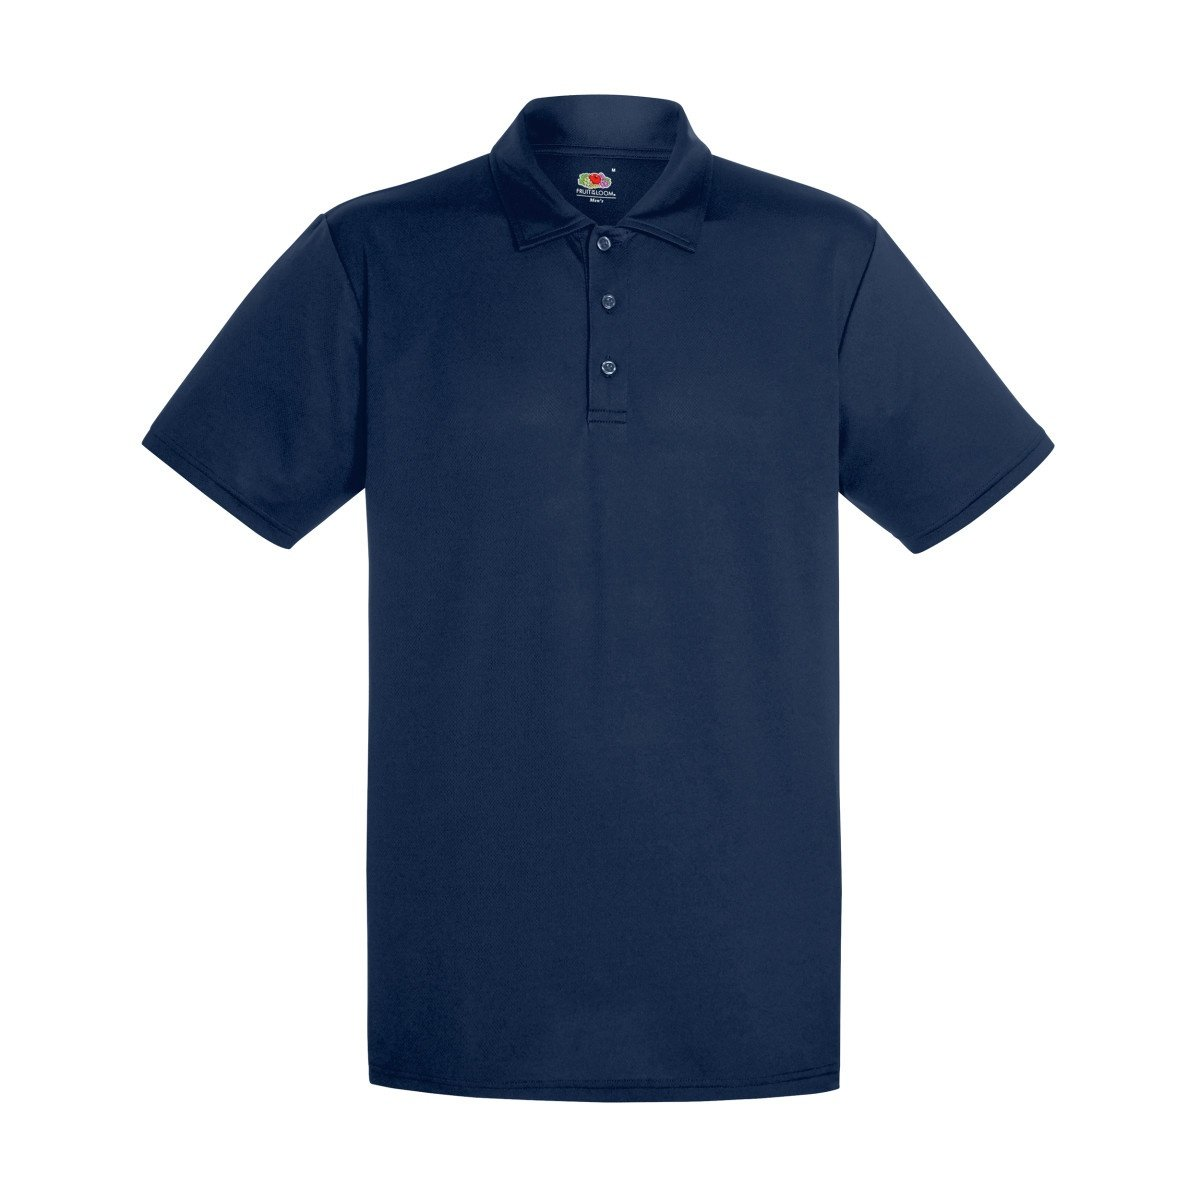 Fruit of the Loom Mens Short Sleeve Moisture Wicking Performance Polo Shirt